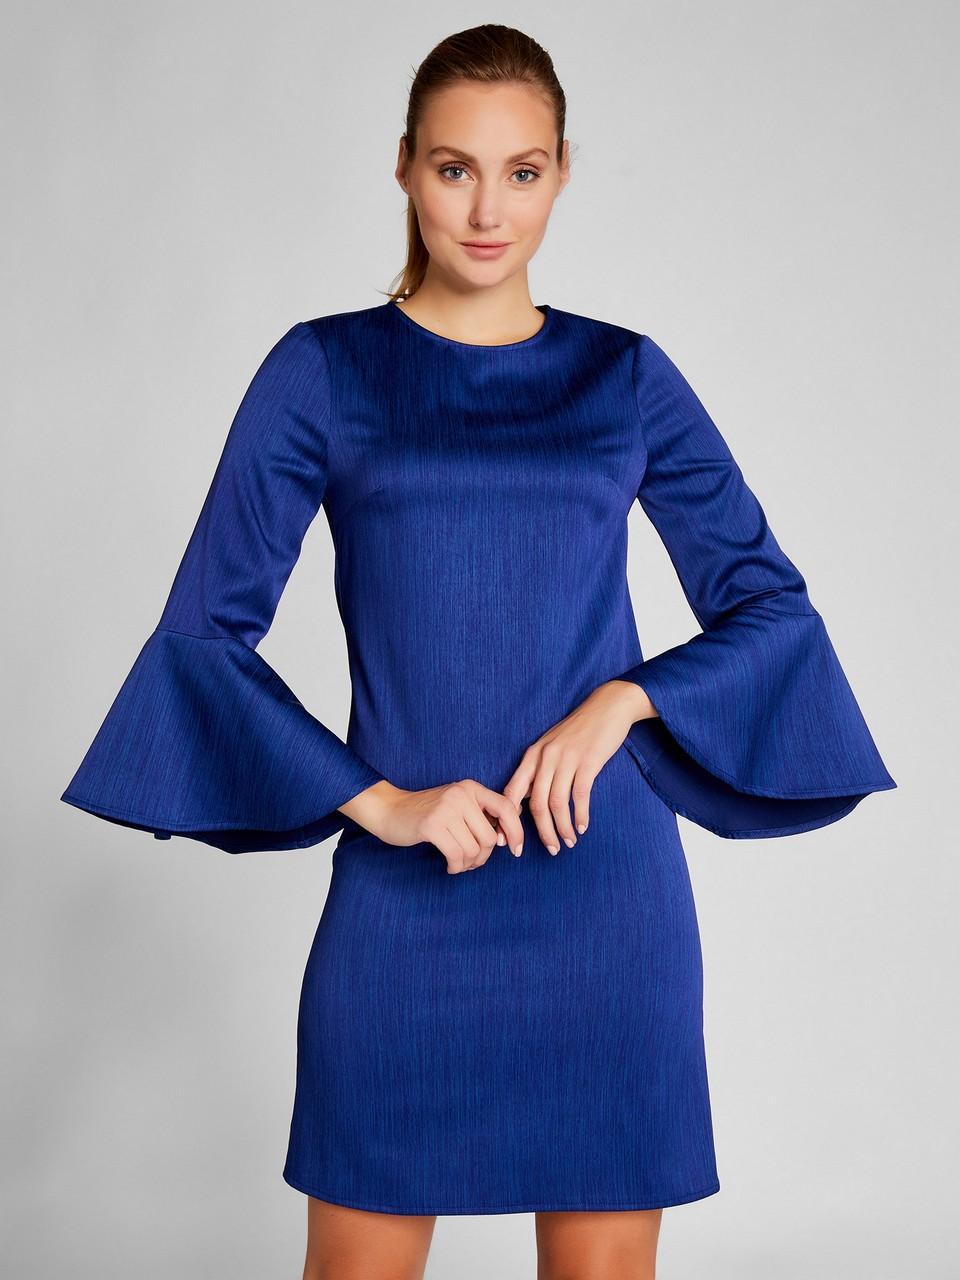 Ruffle Sleeve Mini Satin Dress